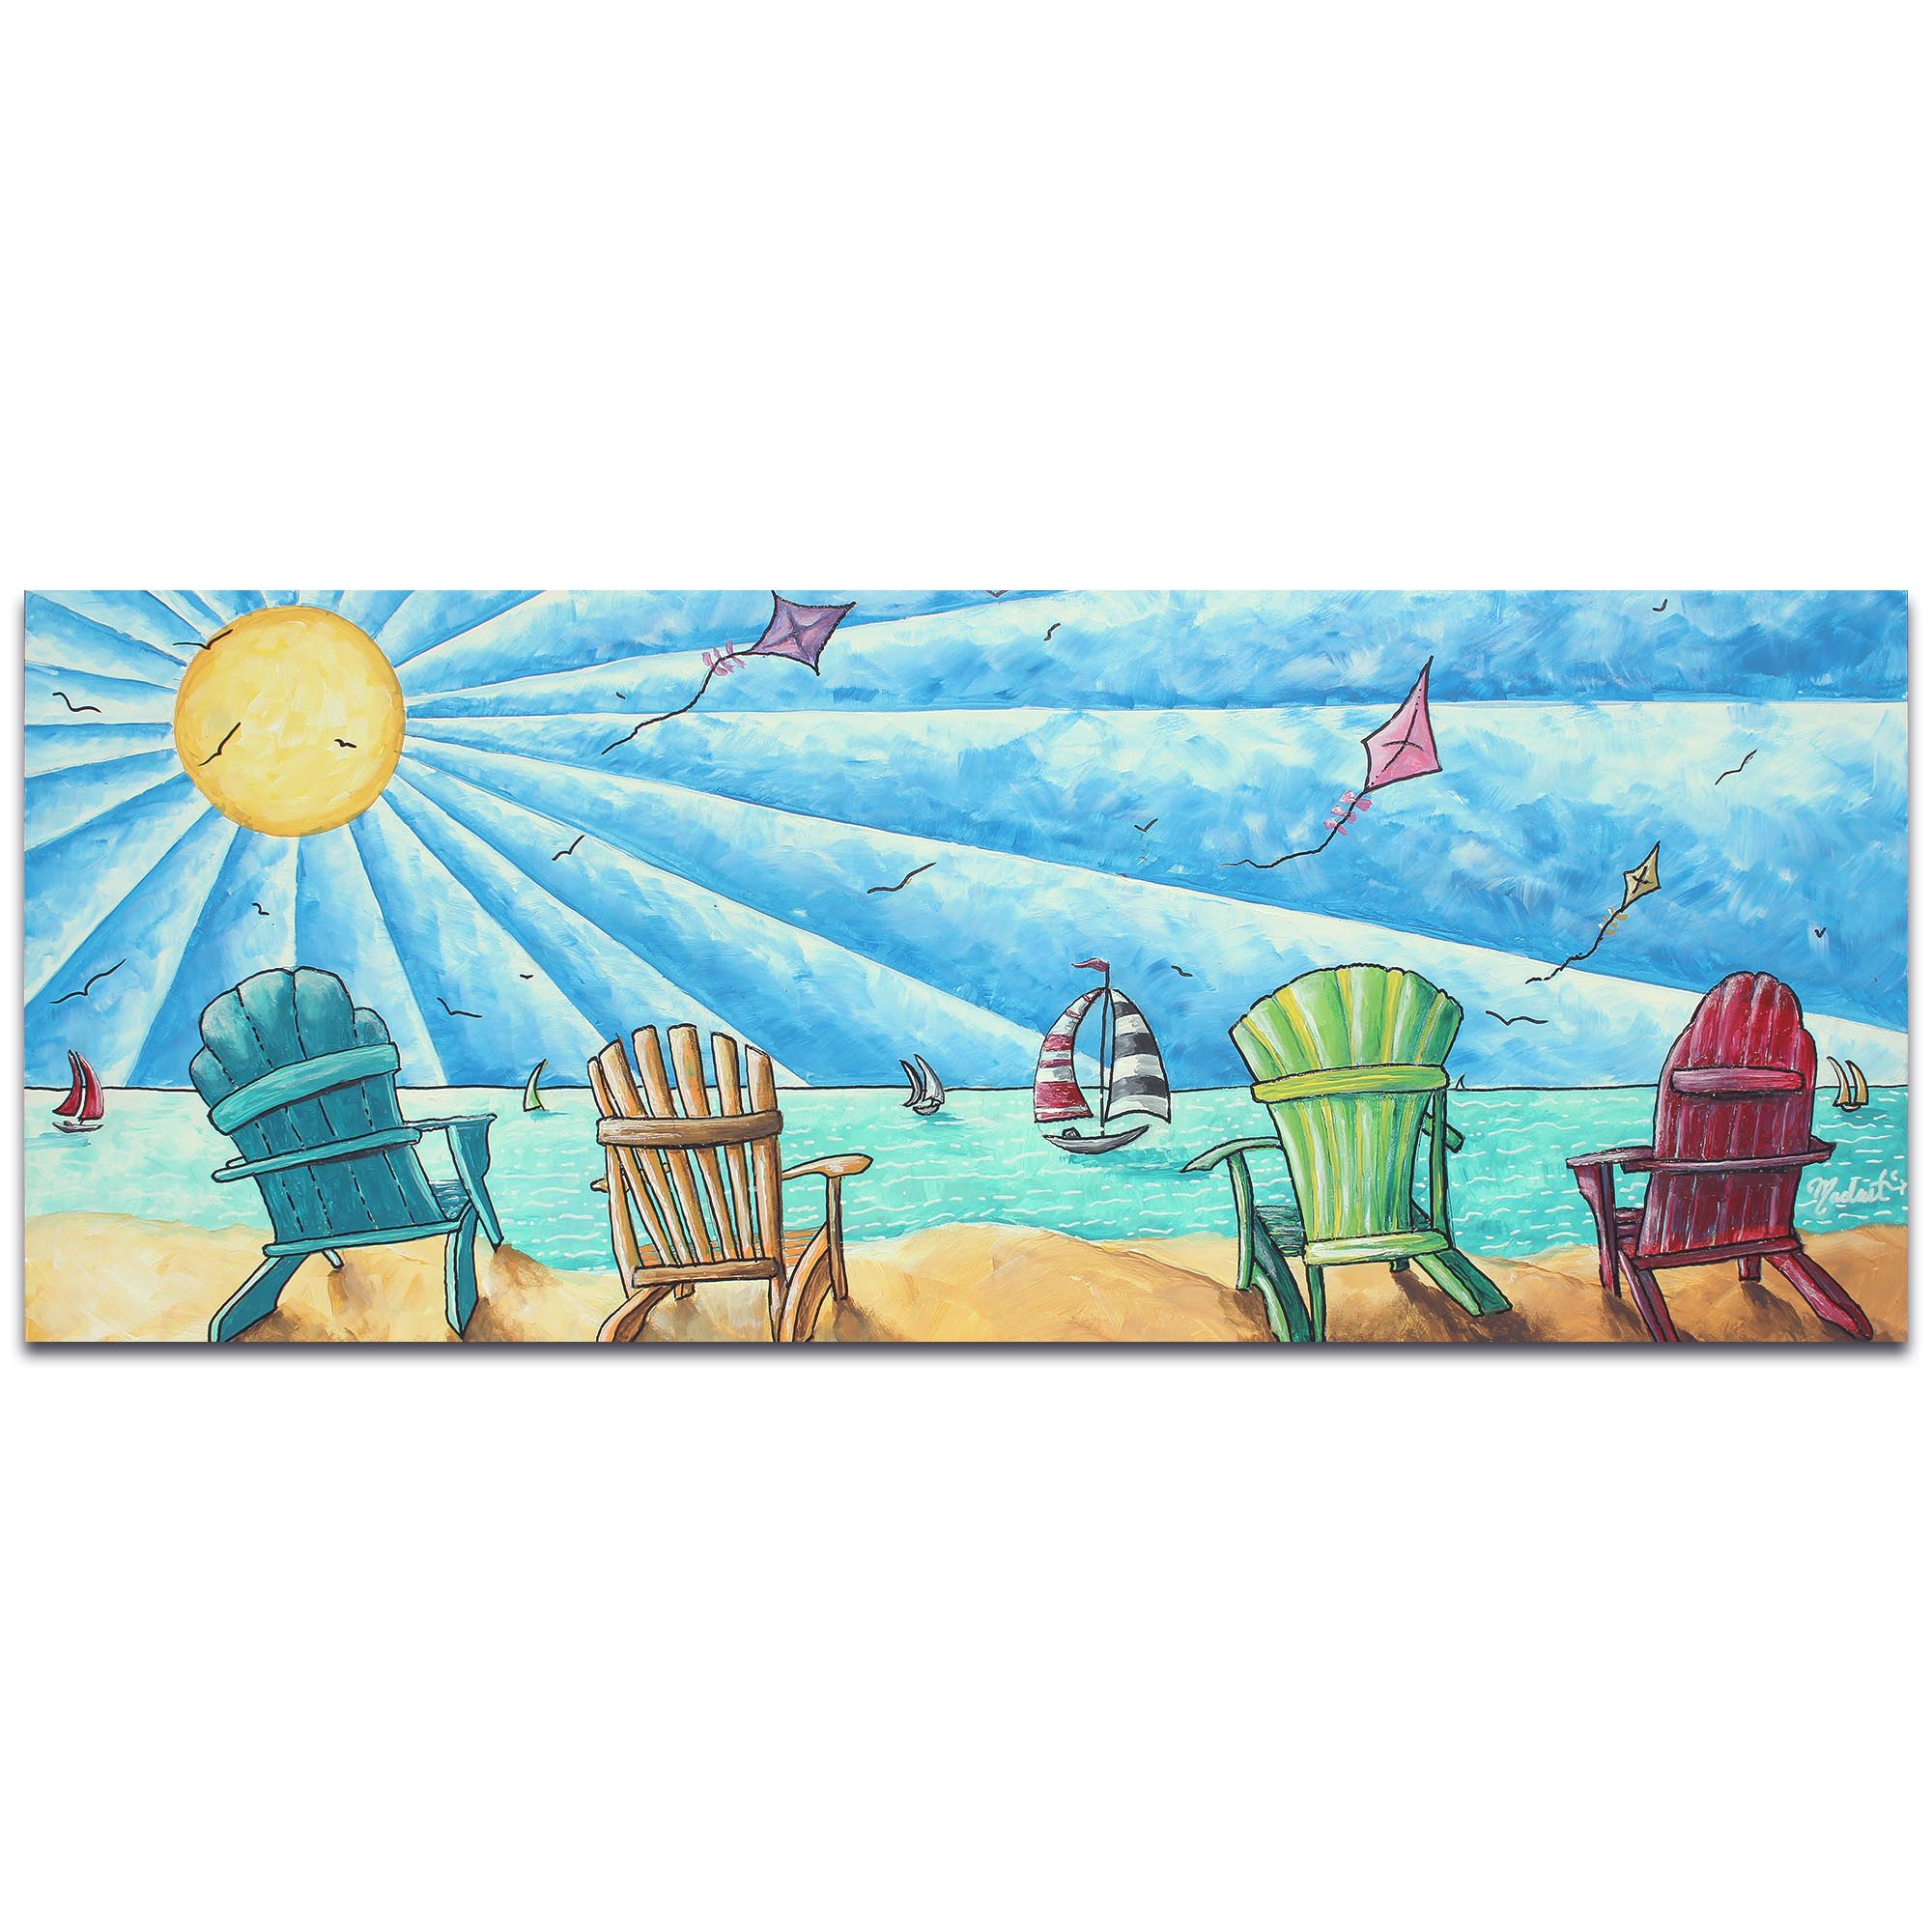 Beach Painting 'Beach Life v1' - Tropical Wall Art on Metal or Acrylic